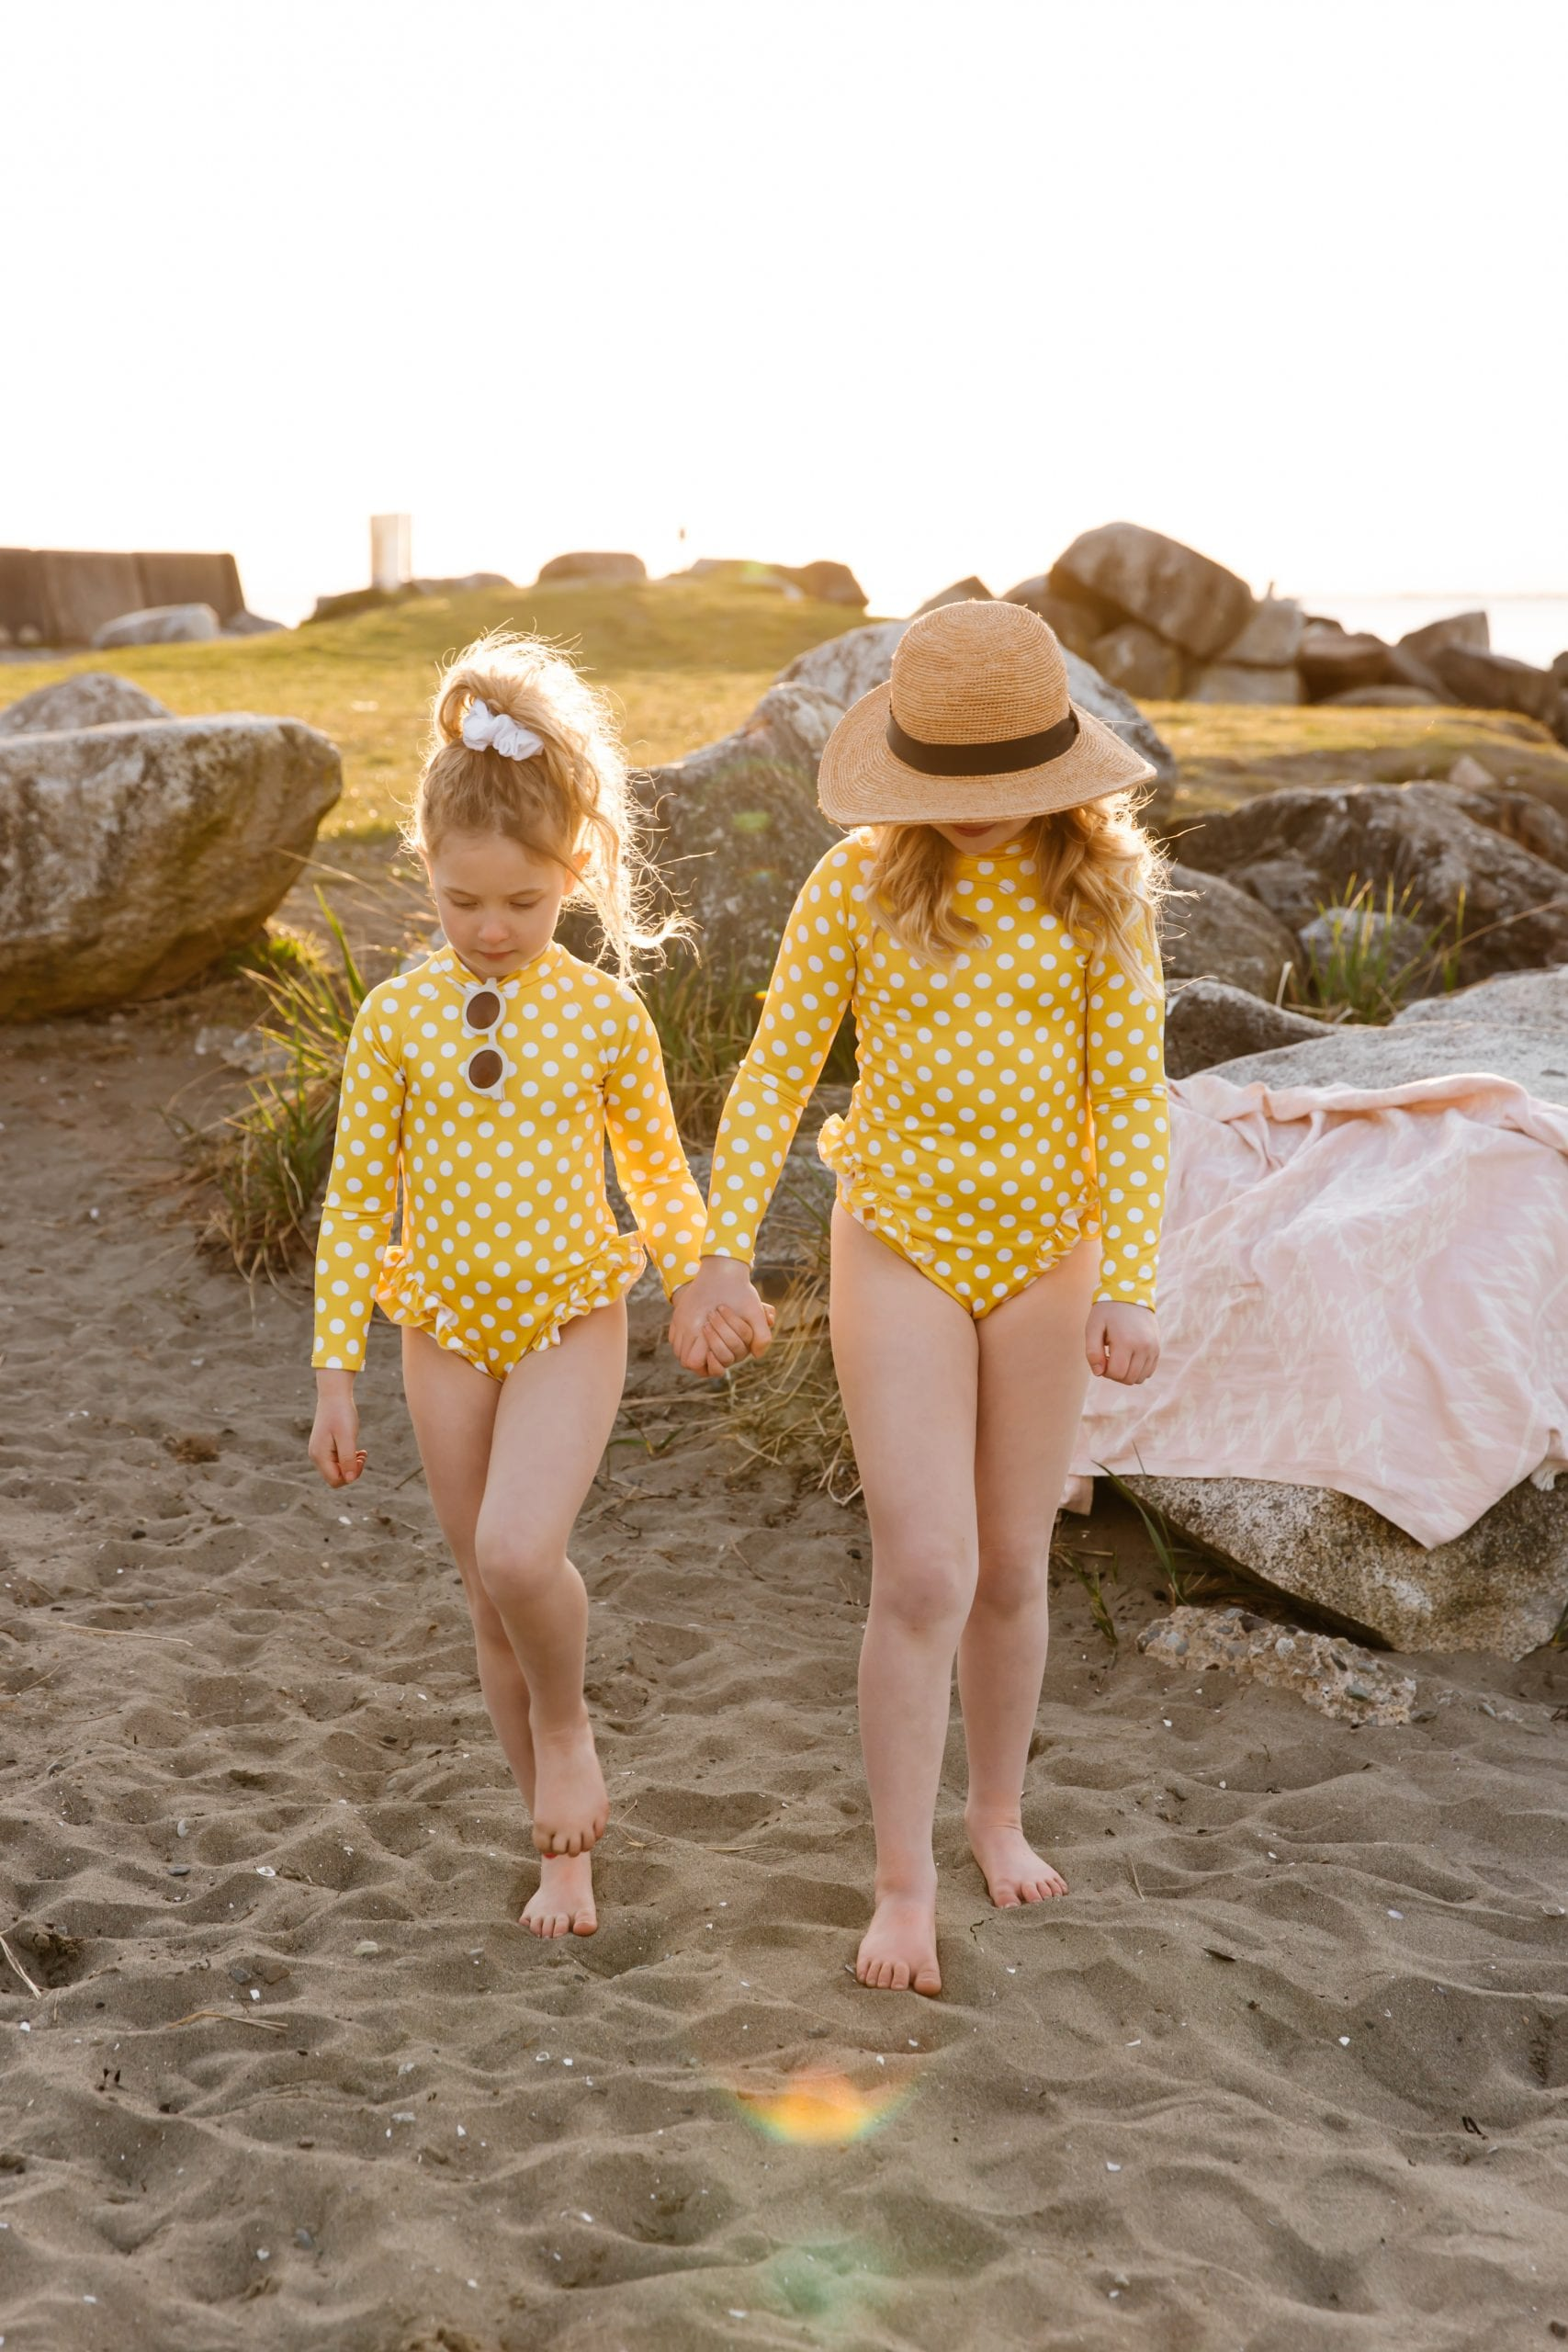 Imagine Perry Girls Rufflebum Rashguard add on in The Summer Jilly Box